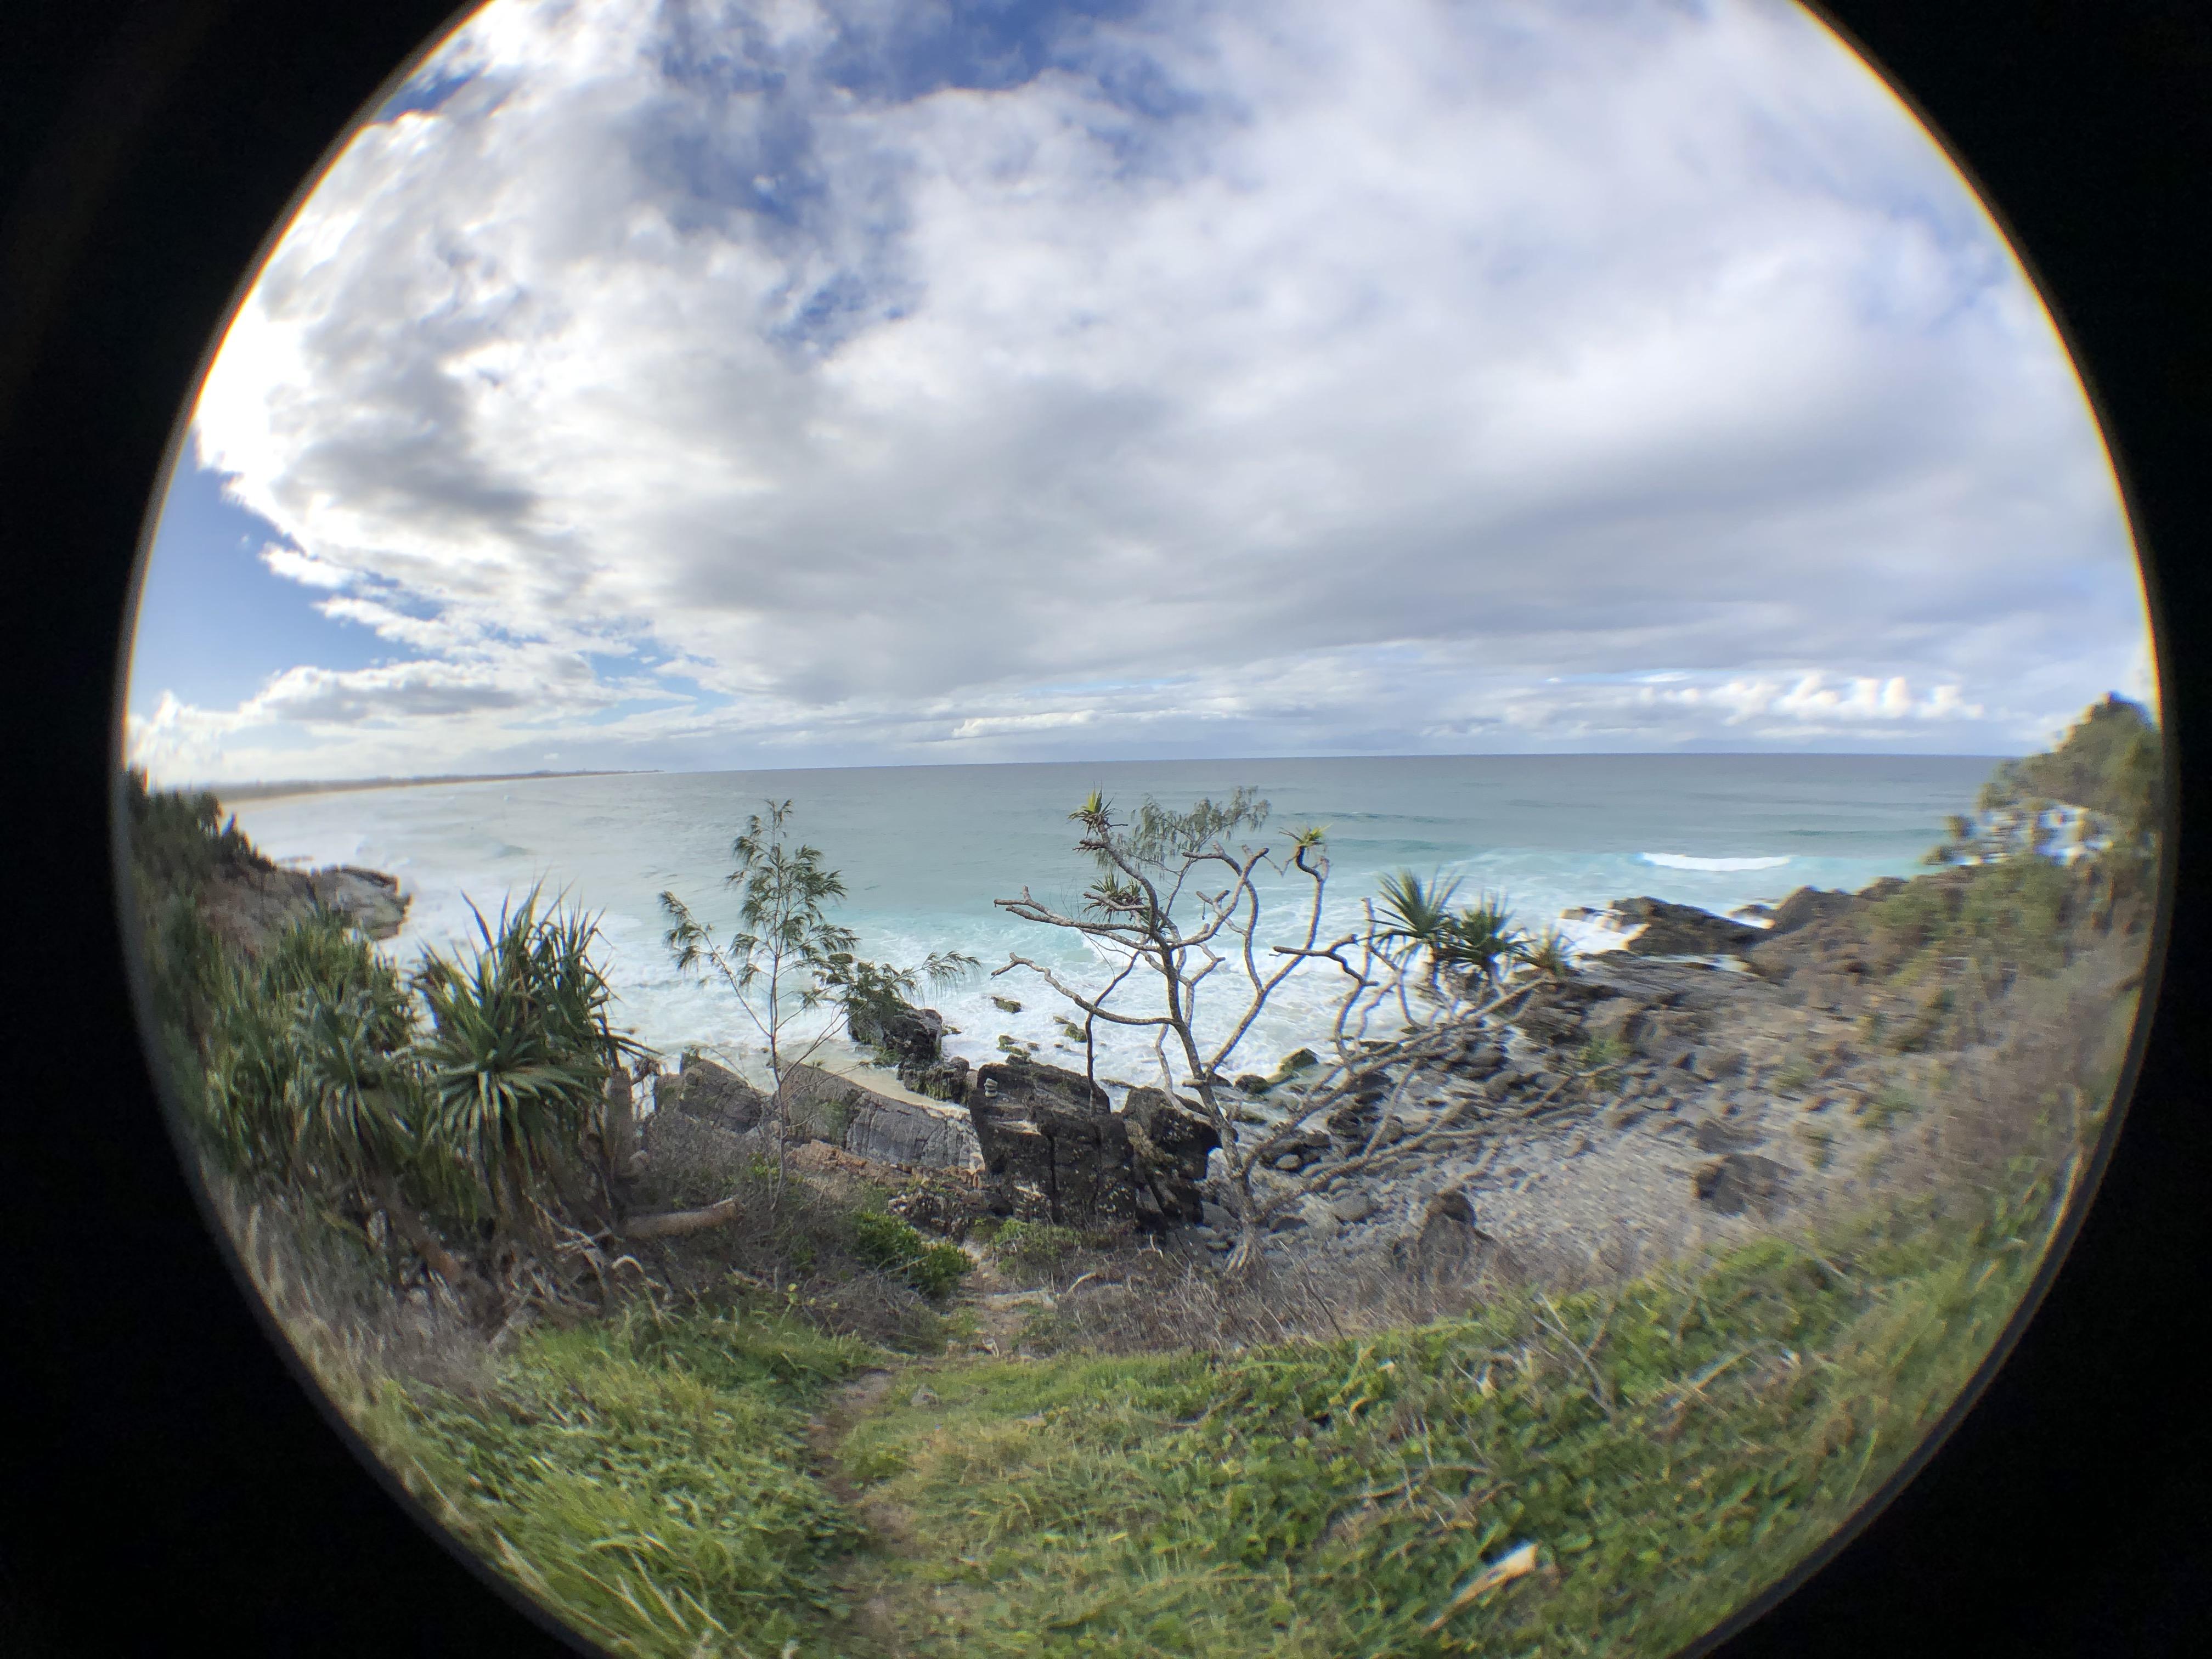 Cabarita Headland with Fisheye Lens